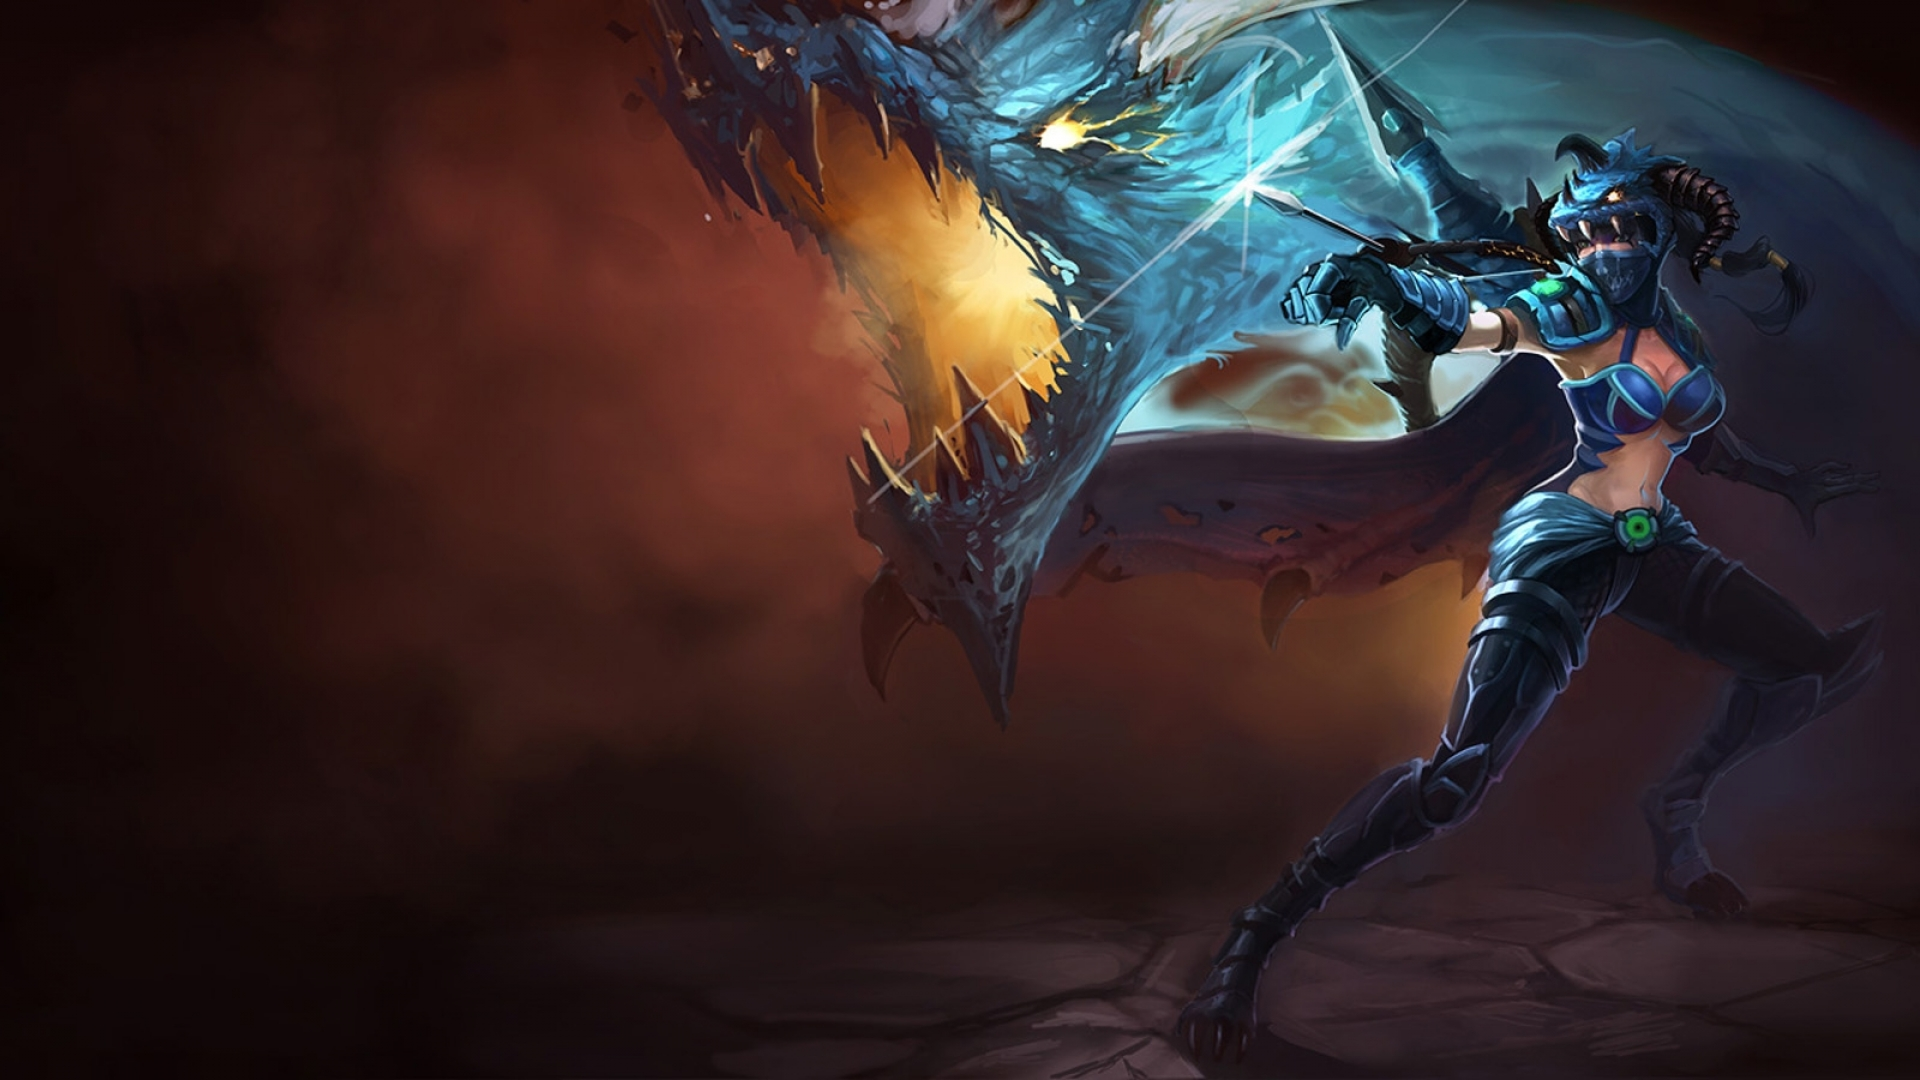 League of Legends wallpaper 81